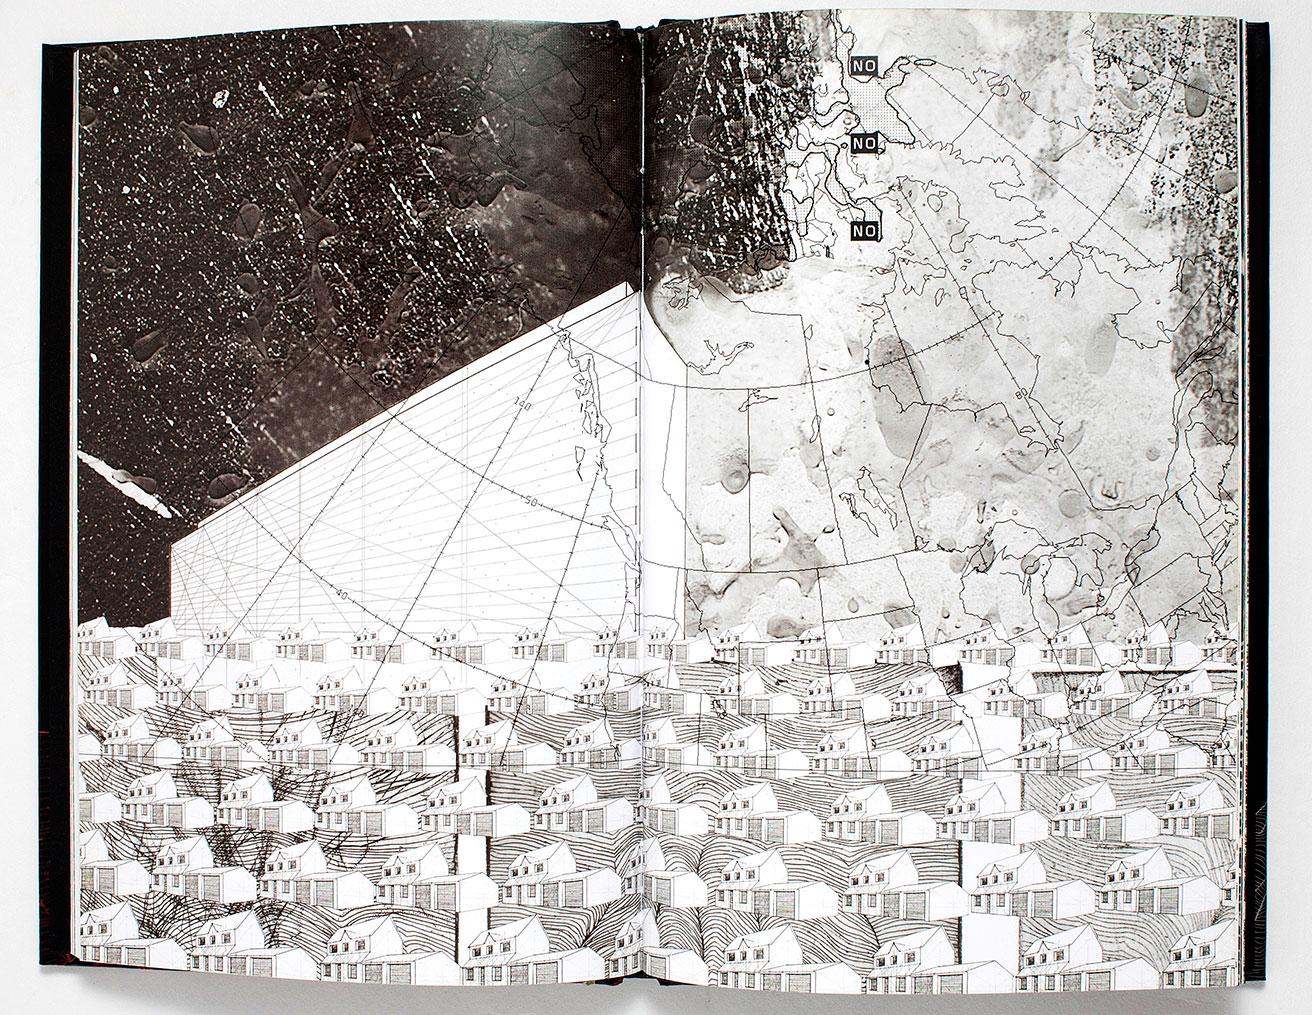 epm-print-management-bristol-art-books-stanley-donwood-3.jpg